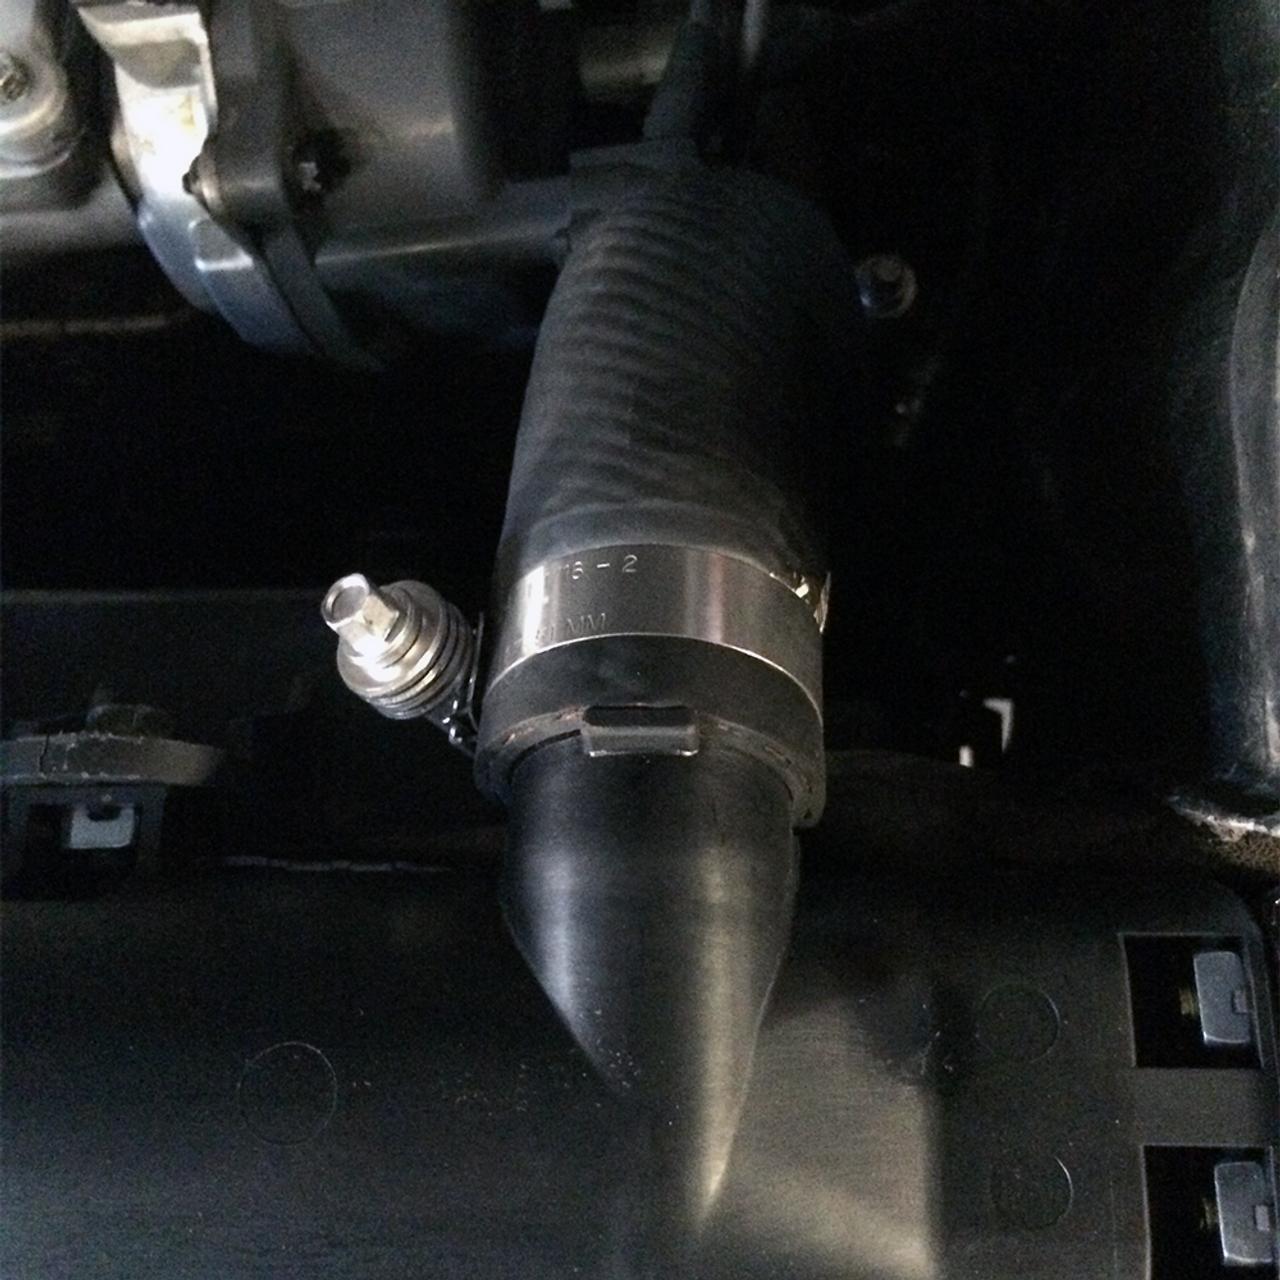 1FZ upper radiator hose installed